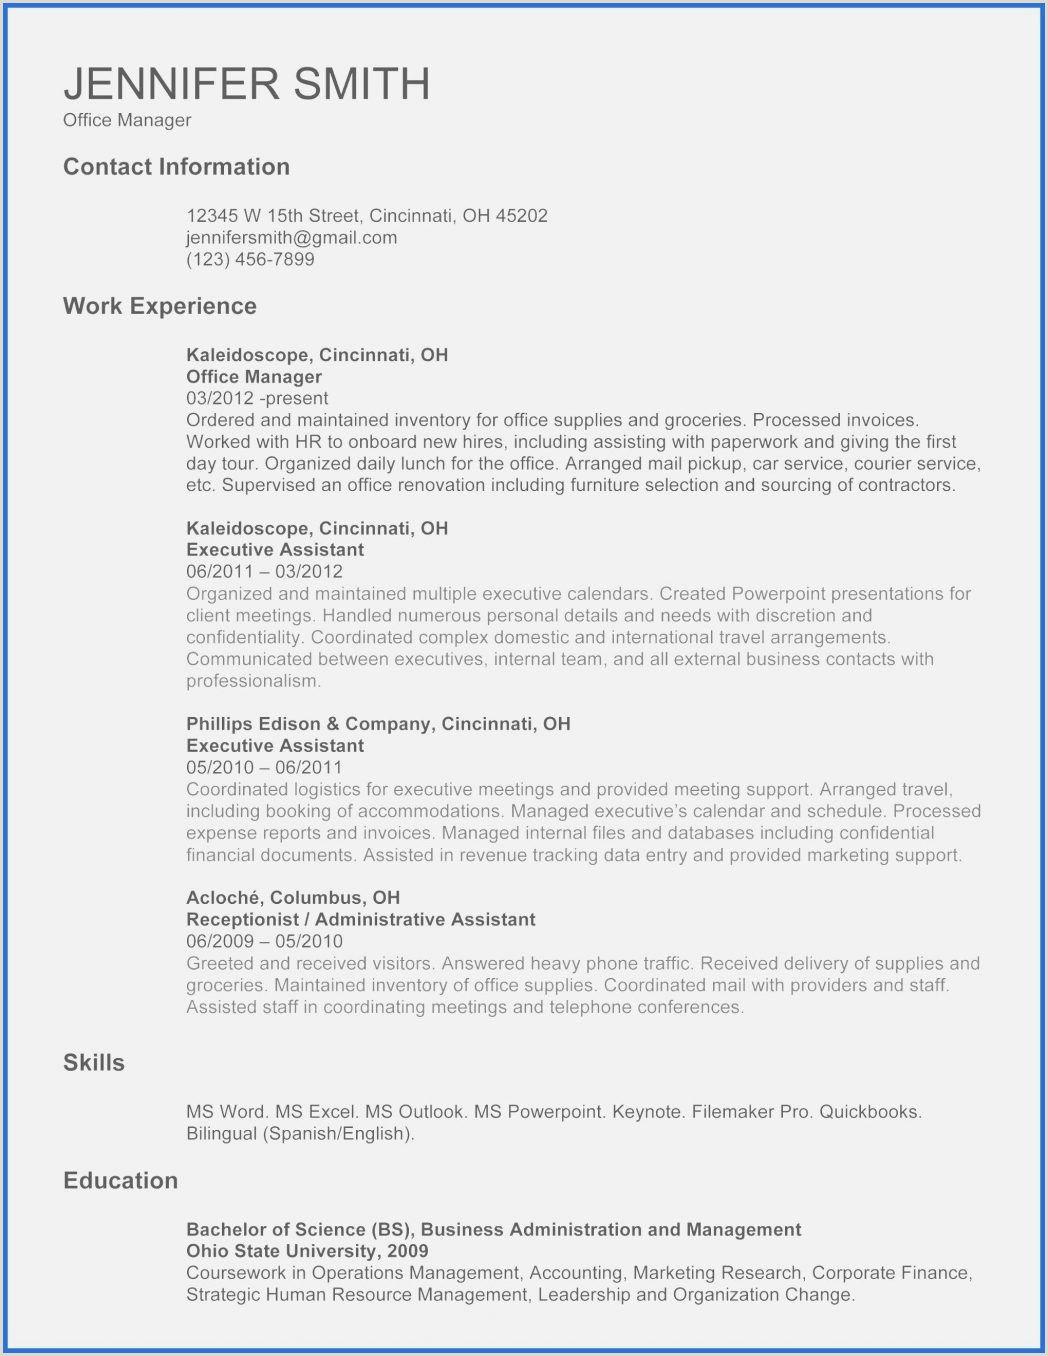 Lebenslauf Muster Kreativ In 2020 Microsoft Word Resume Template Resume Template Word Student Resume Template